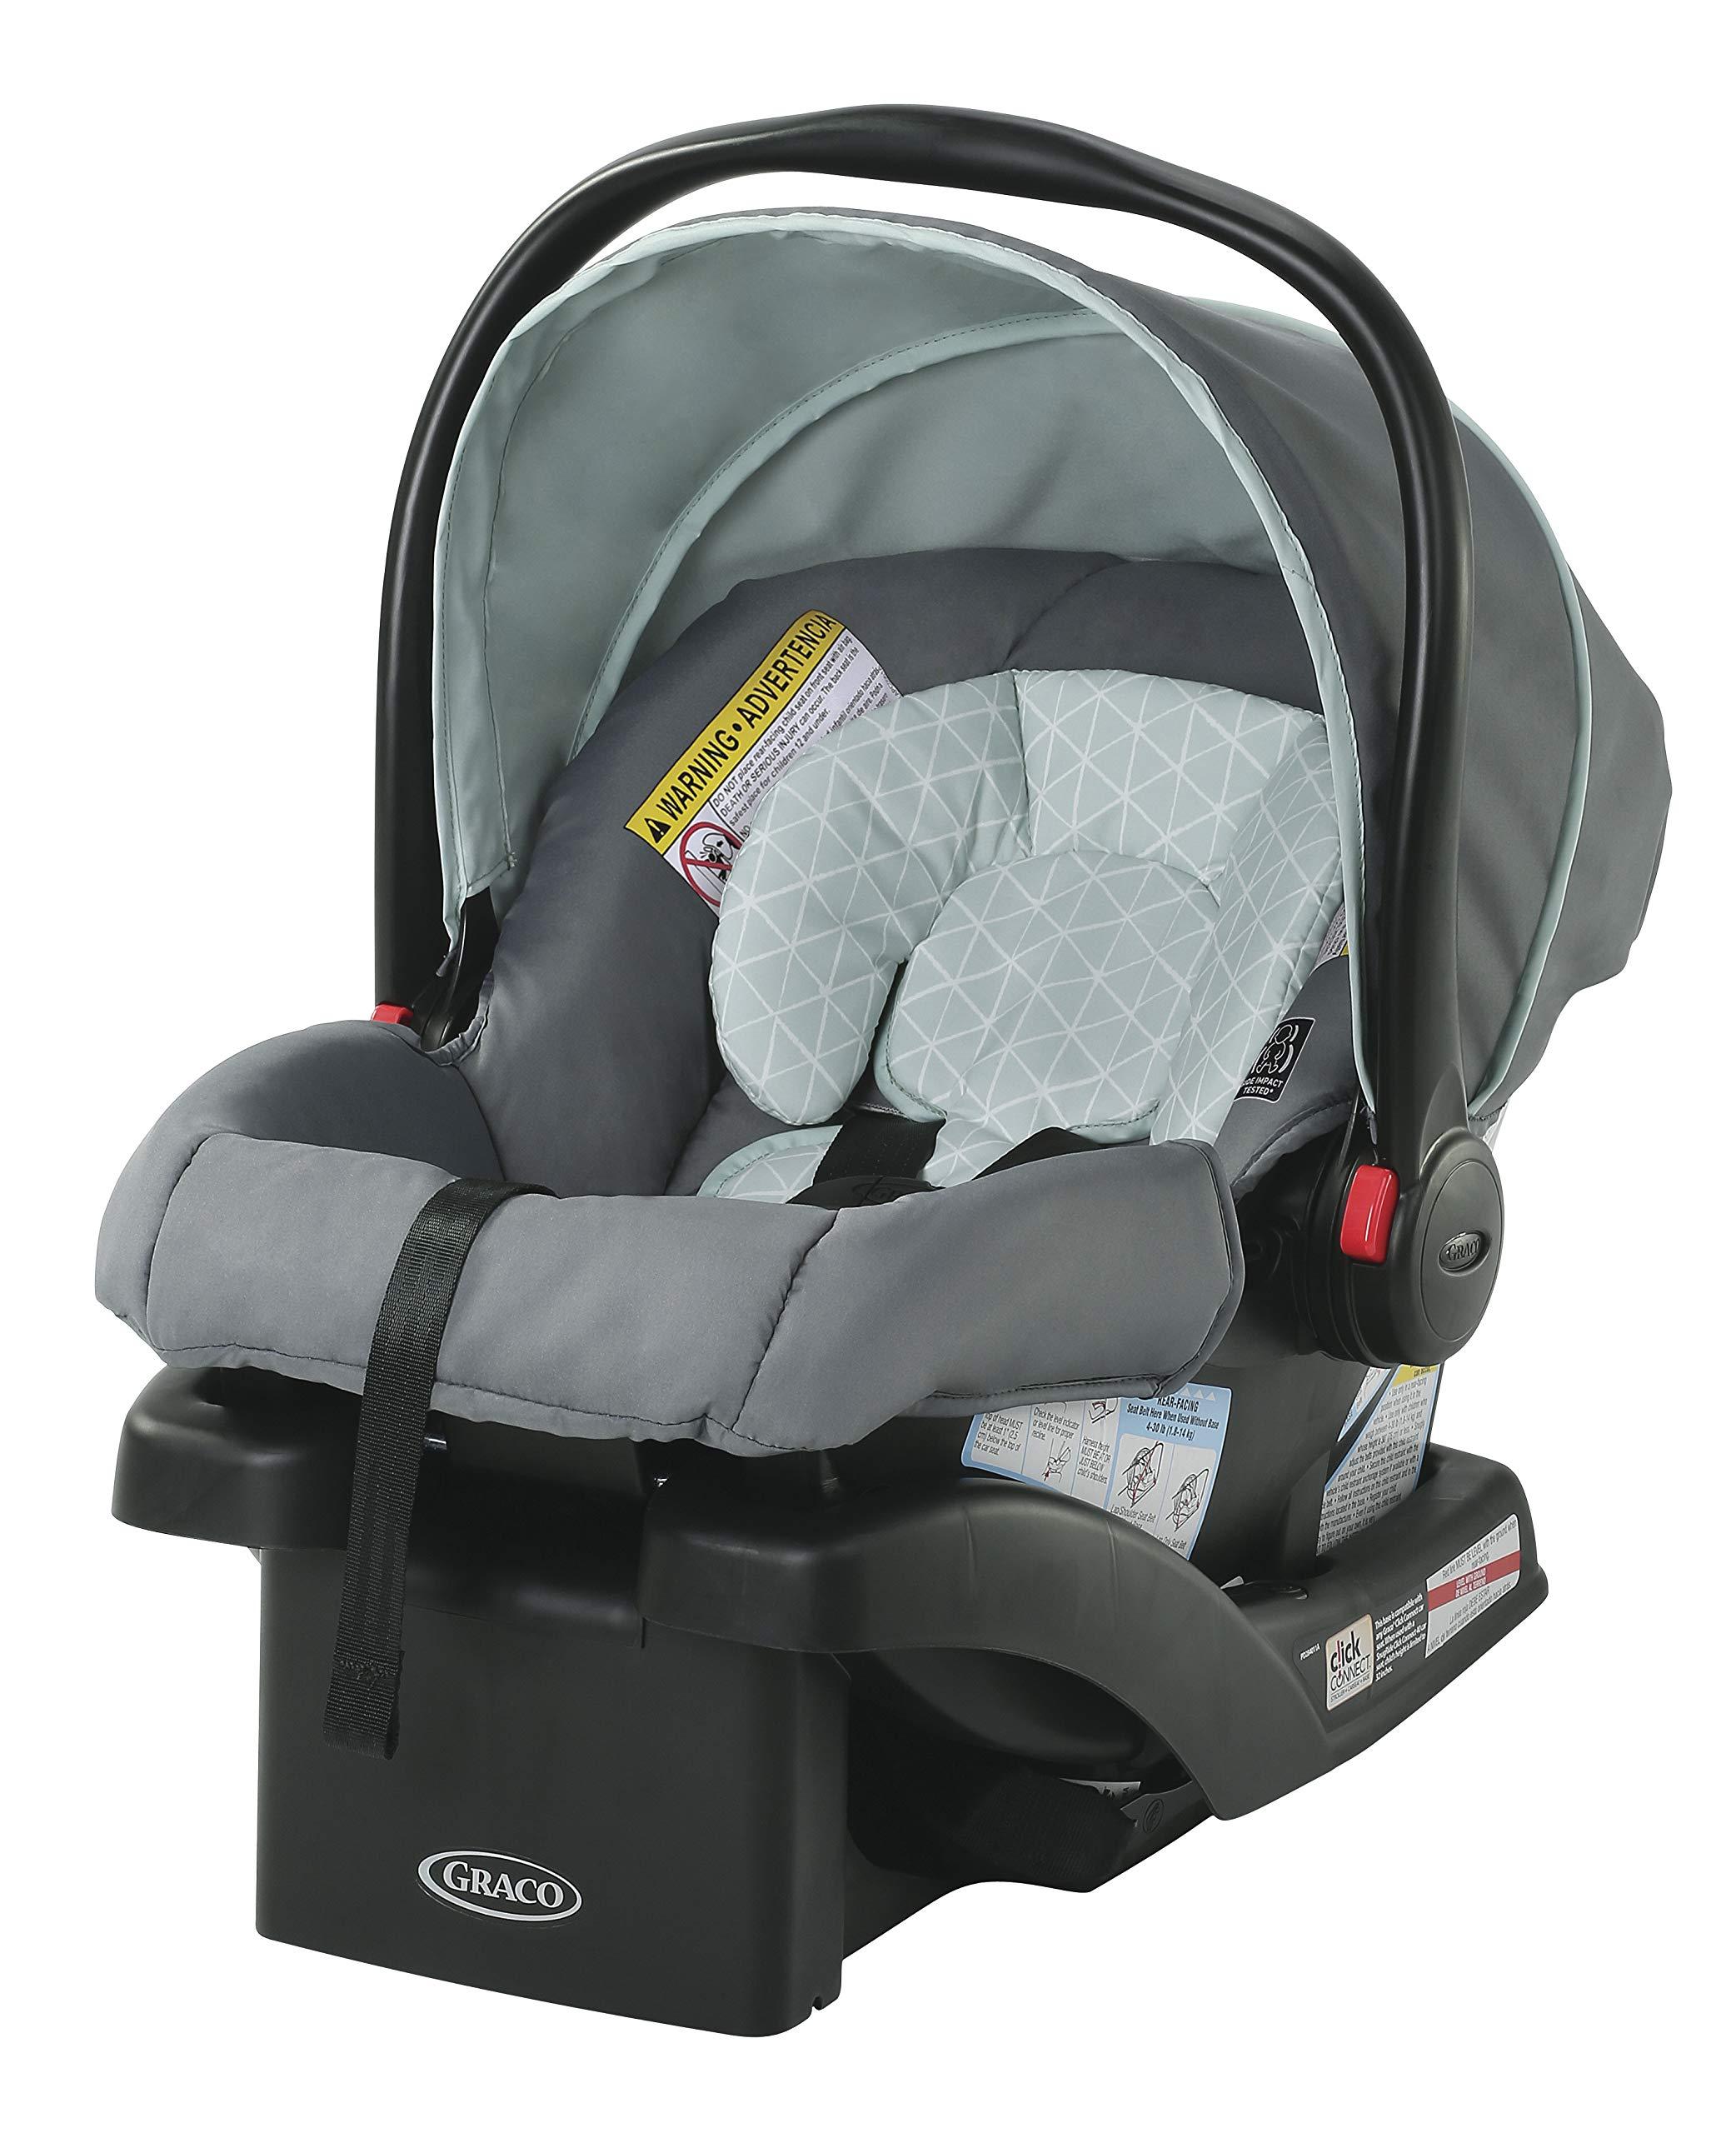 Graco SnugRide Essentials Click Connect 30 Infant Car Seat, Winfield